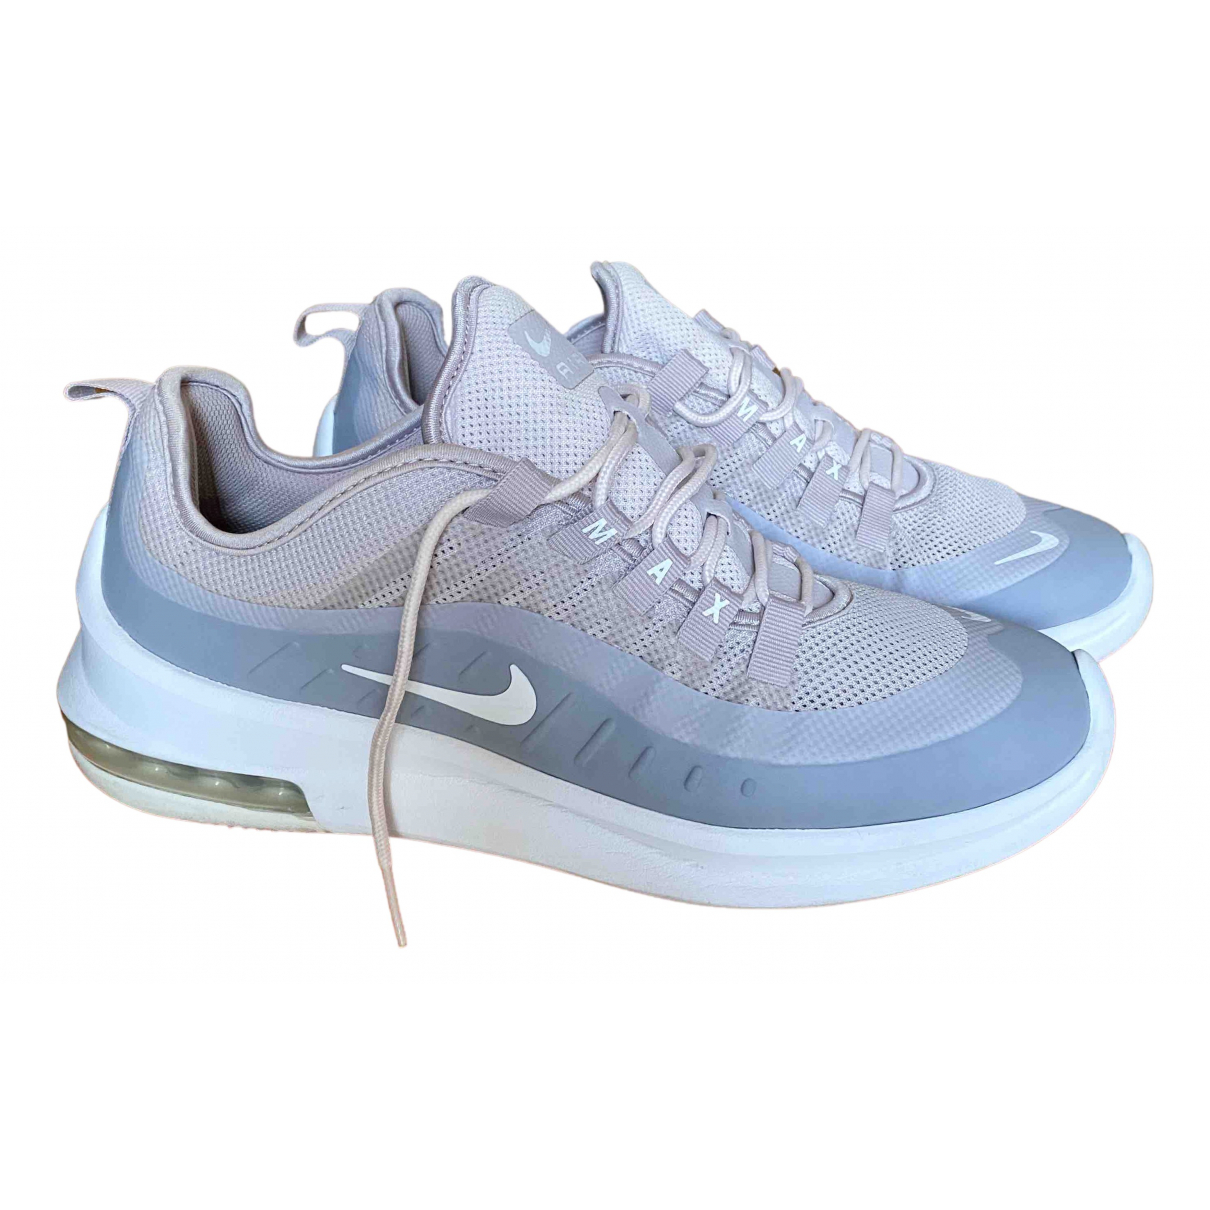 Nike Air Max  Grey Cloth Trainers for Women 41 EU